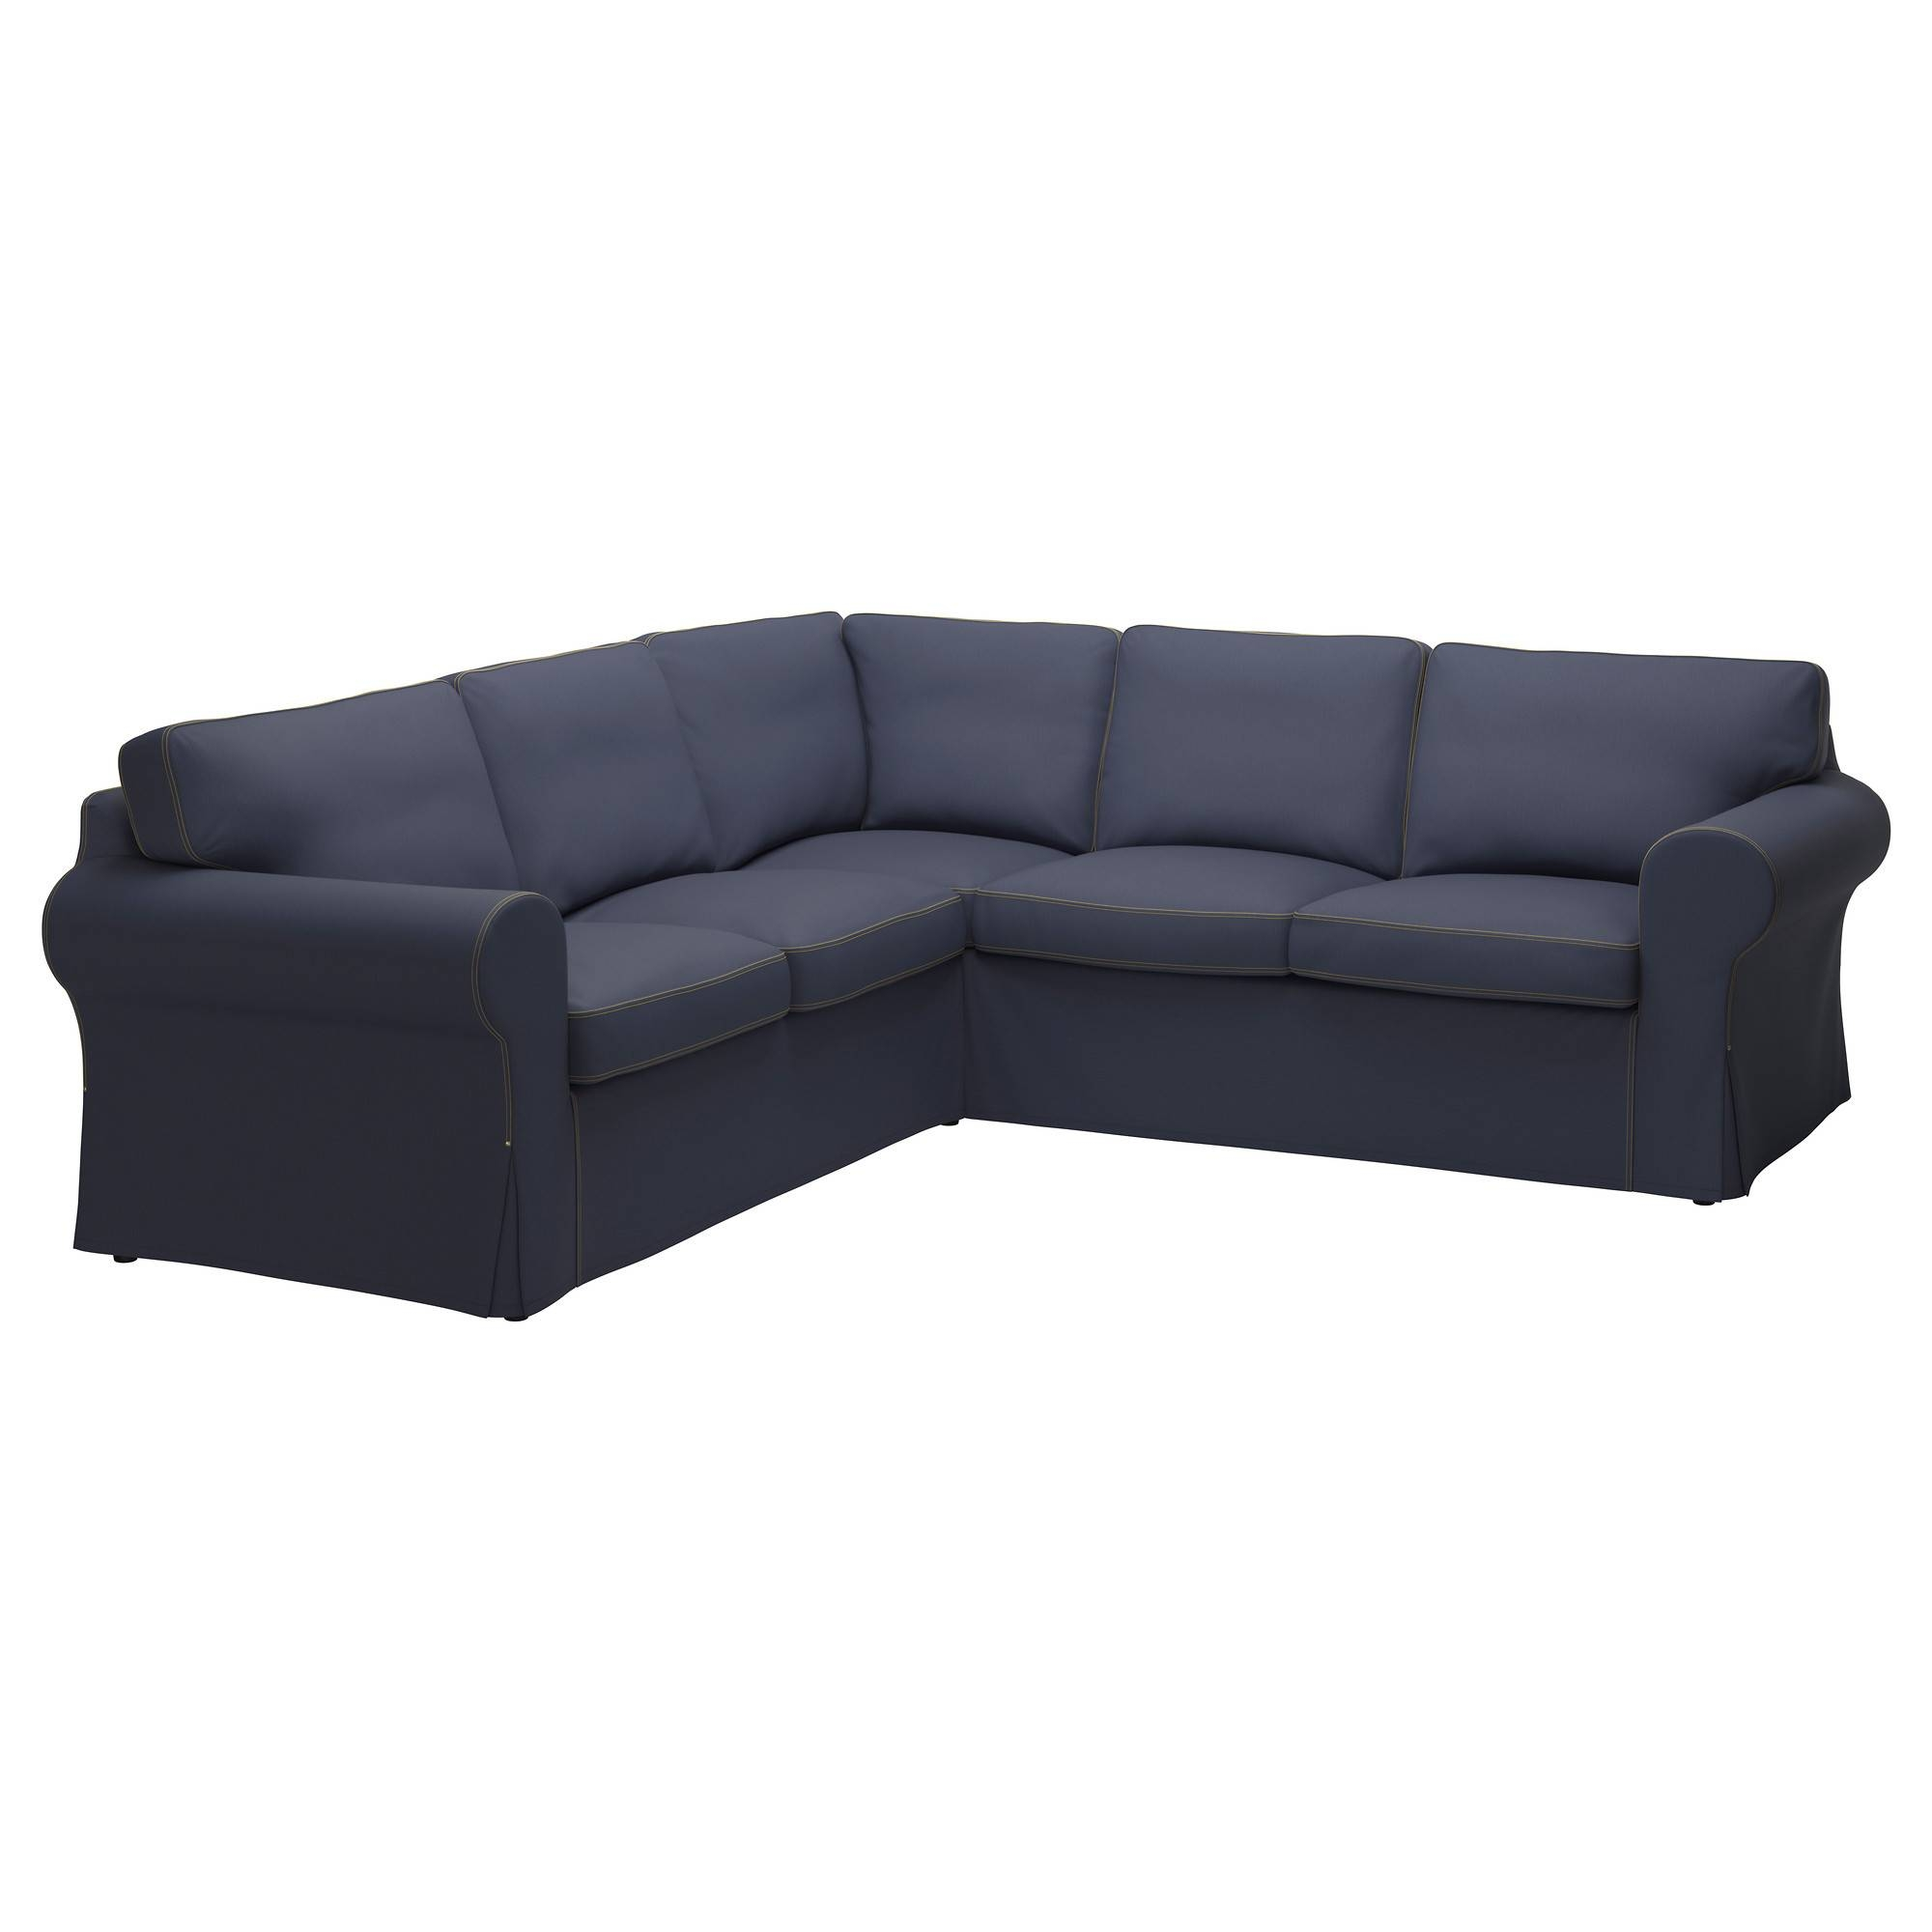 Sectional Corner Sofa | Sofa Gallery | Kengire inside 2X2 Corner Sofas (Image 21 of 30)